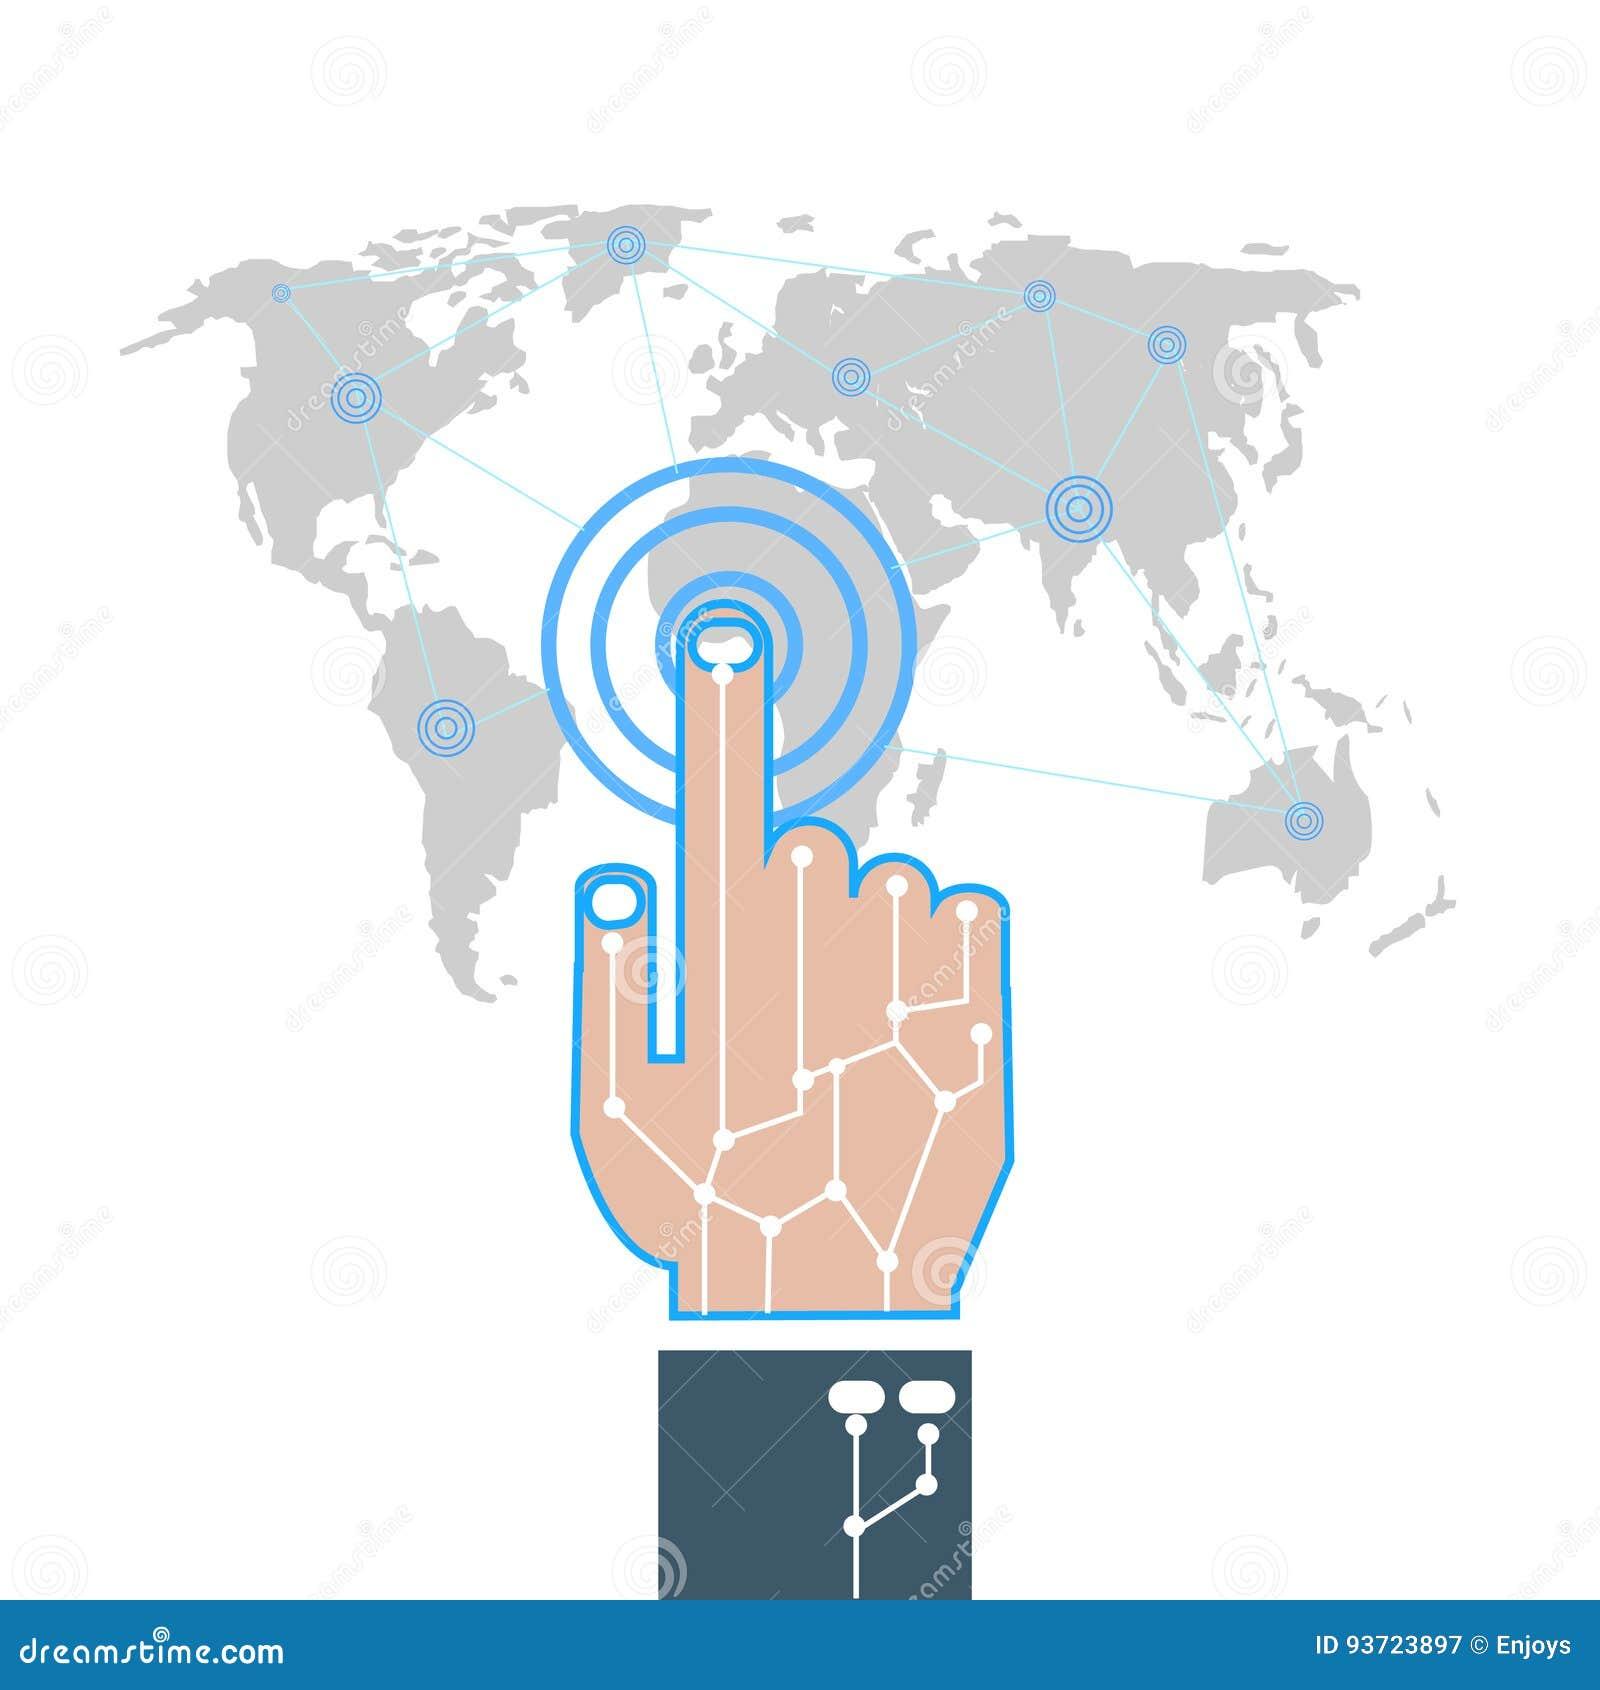 Illustrator-hand Touch Gesture On Futuristic Technology